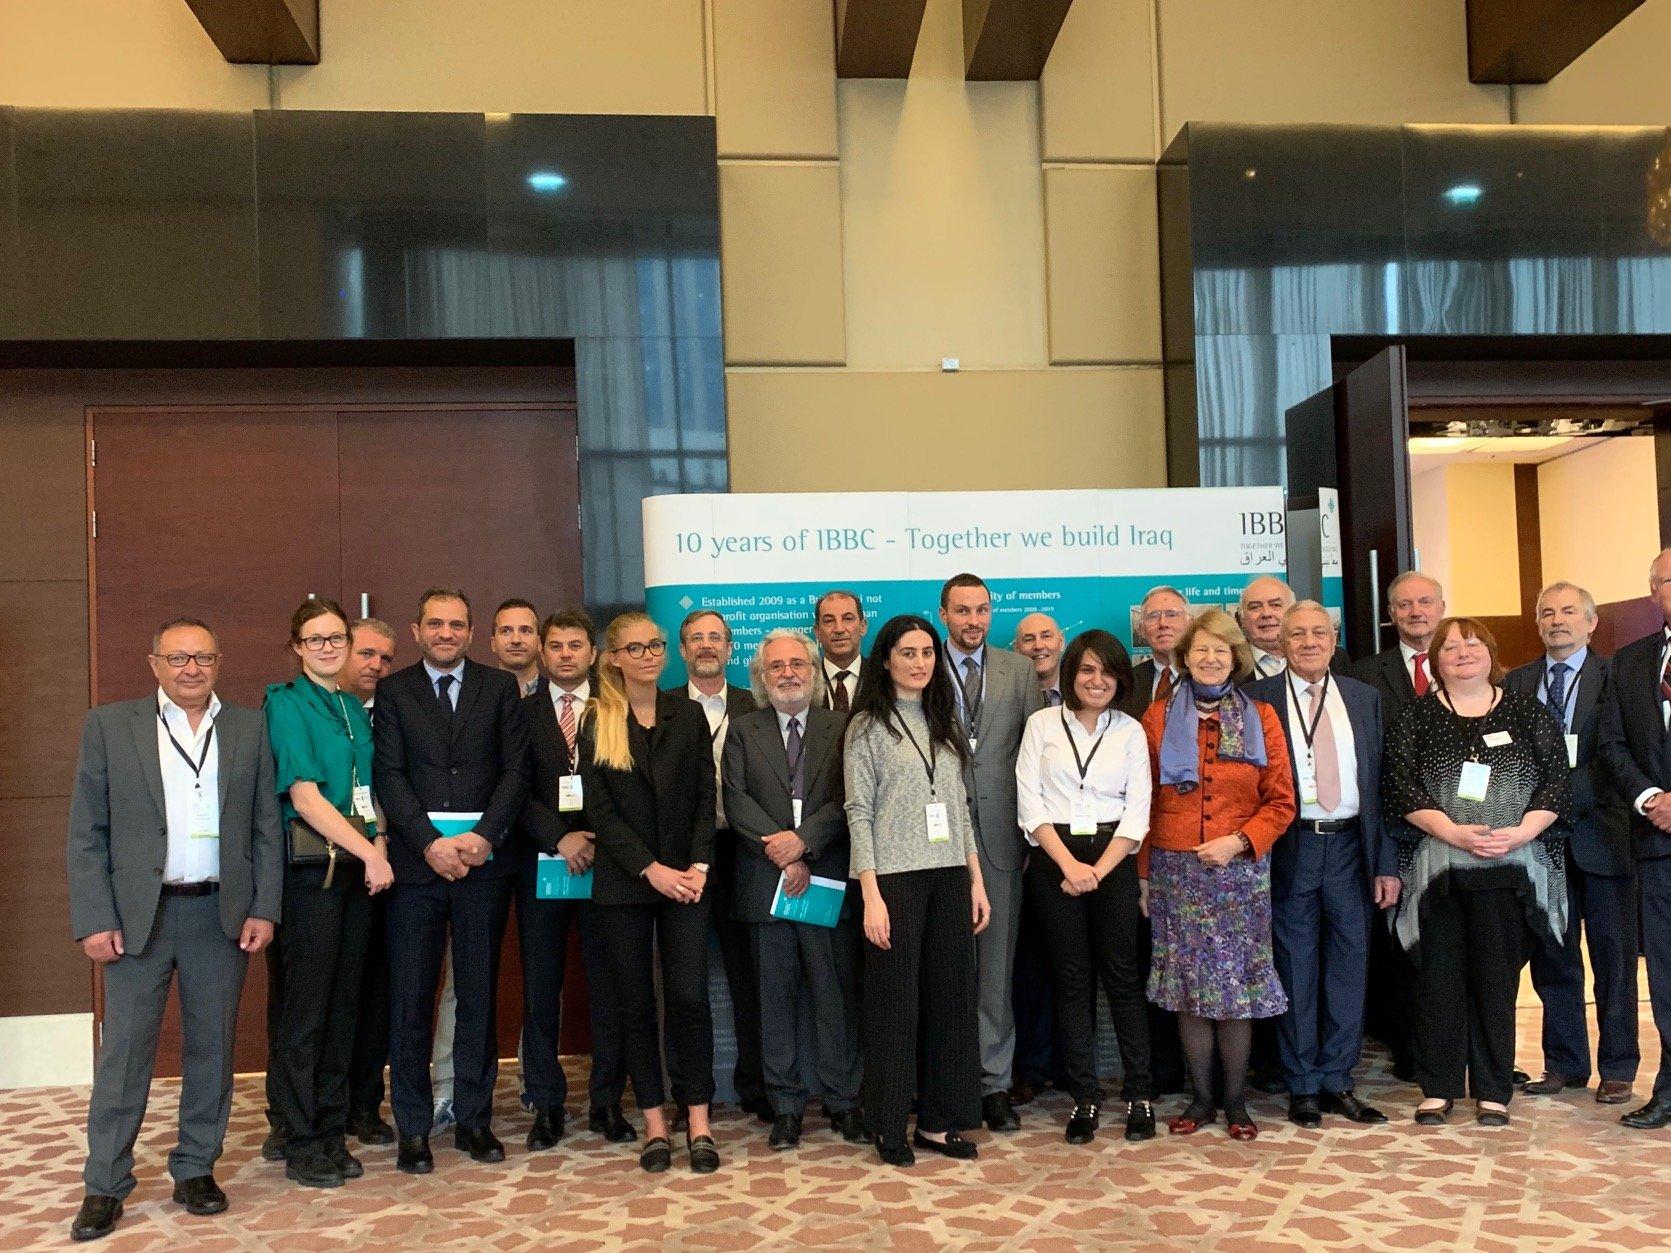 IBBC Autumn Conference in Dubai Group-image